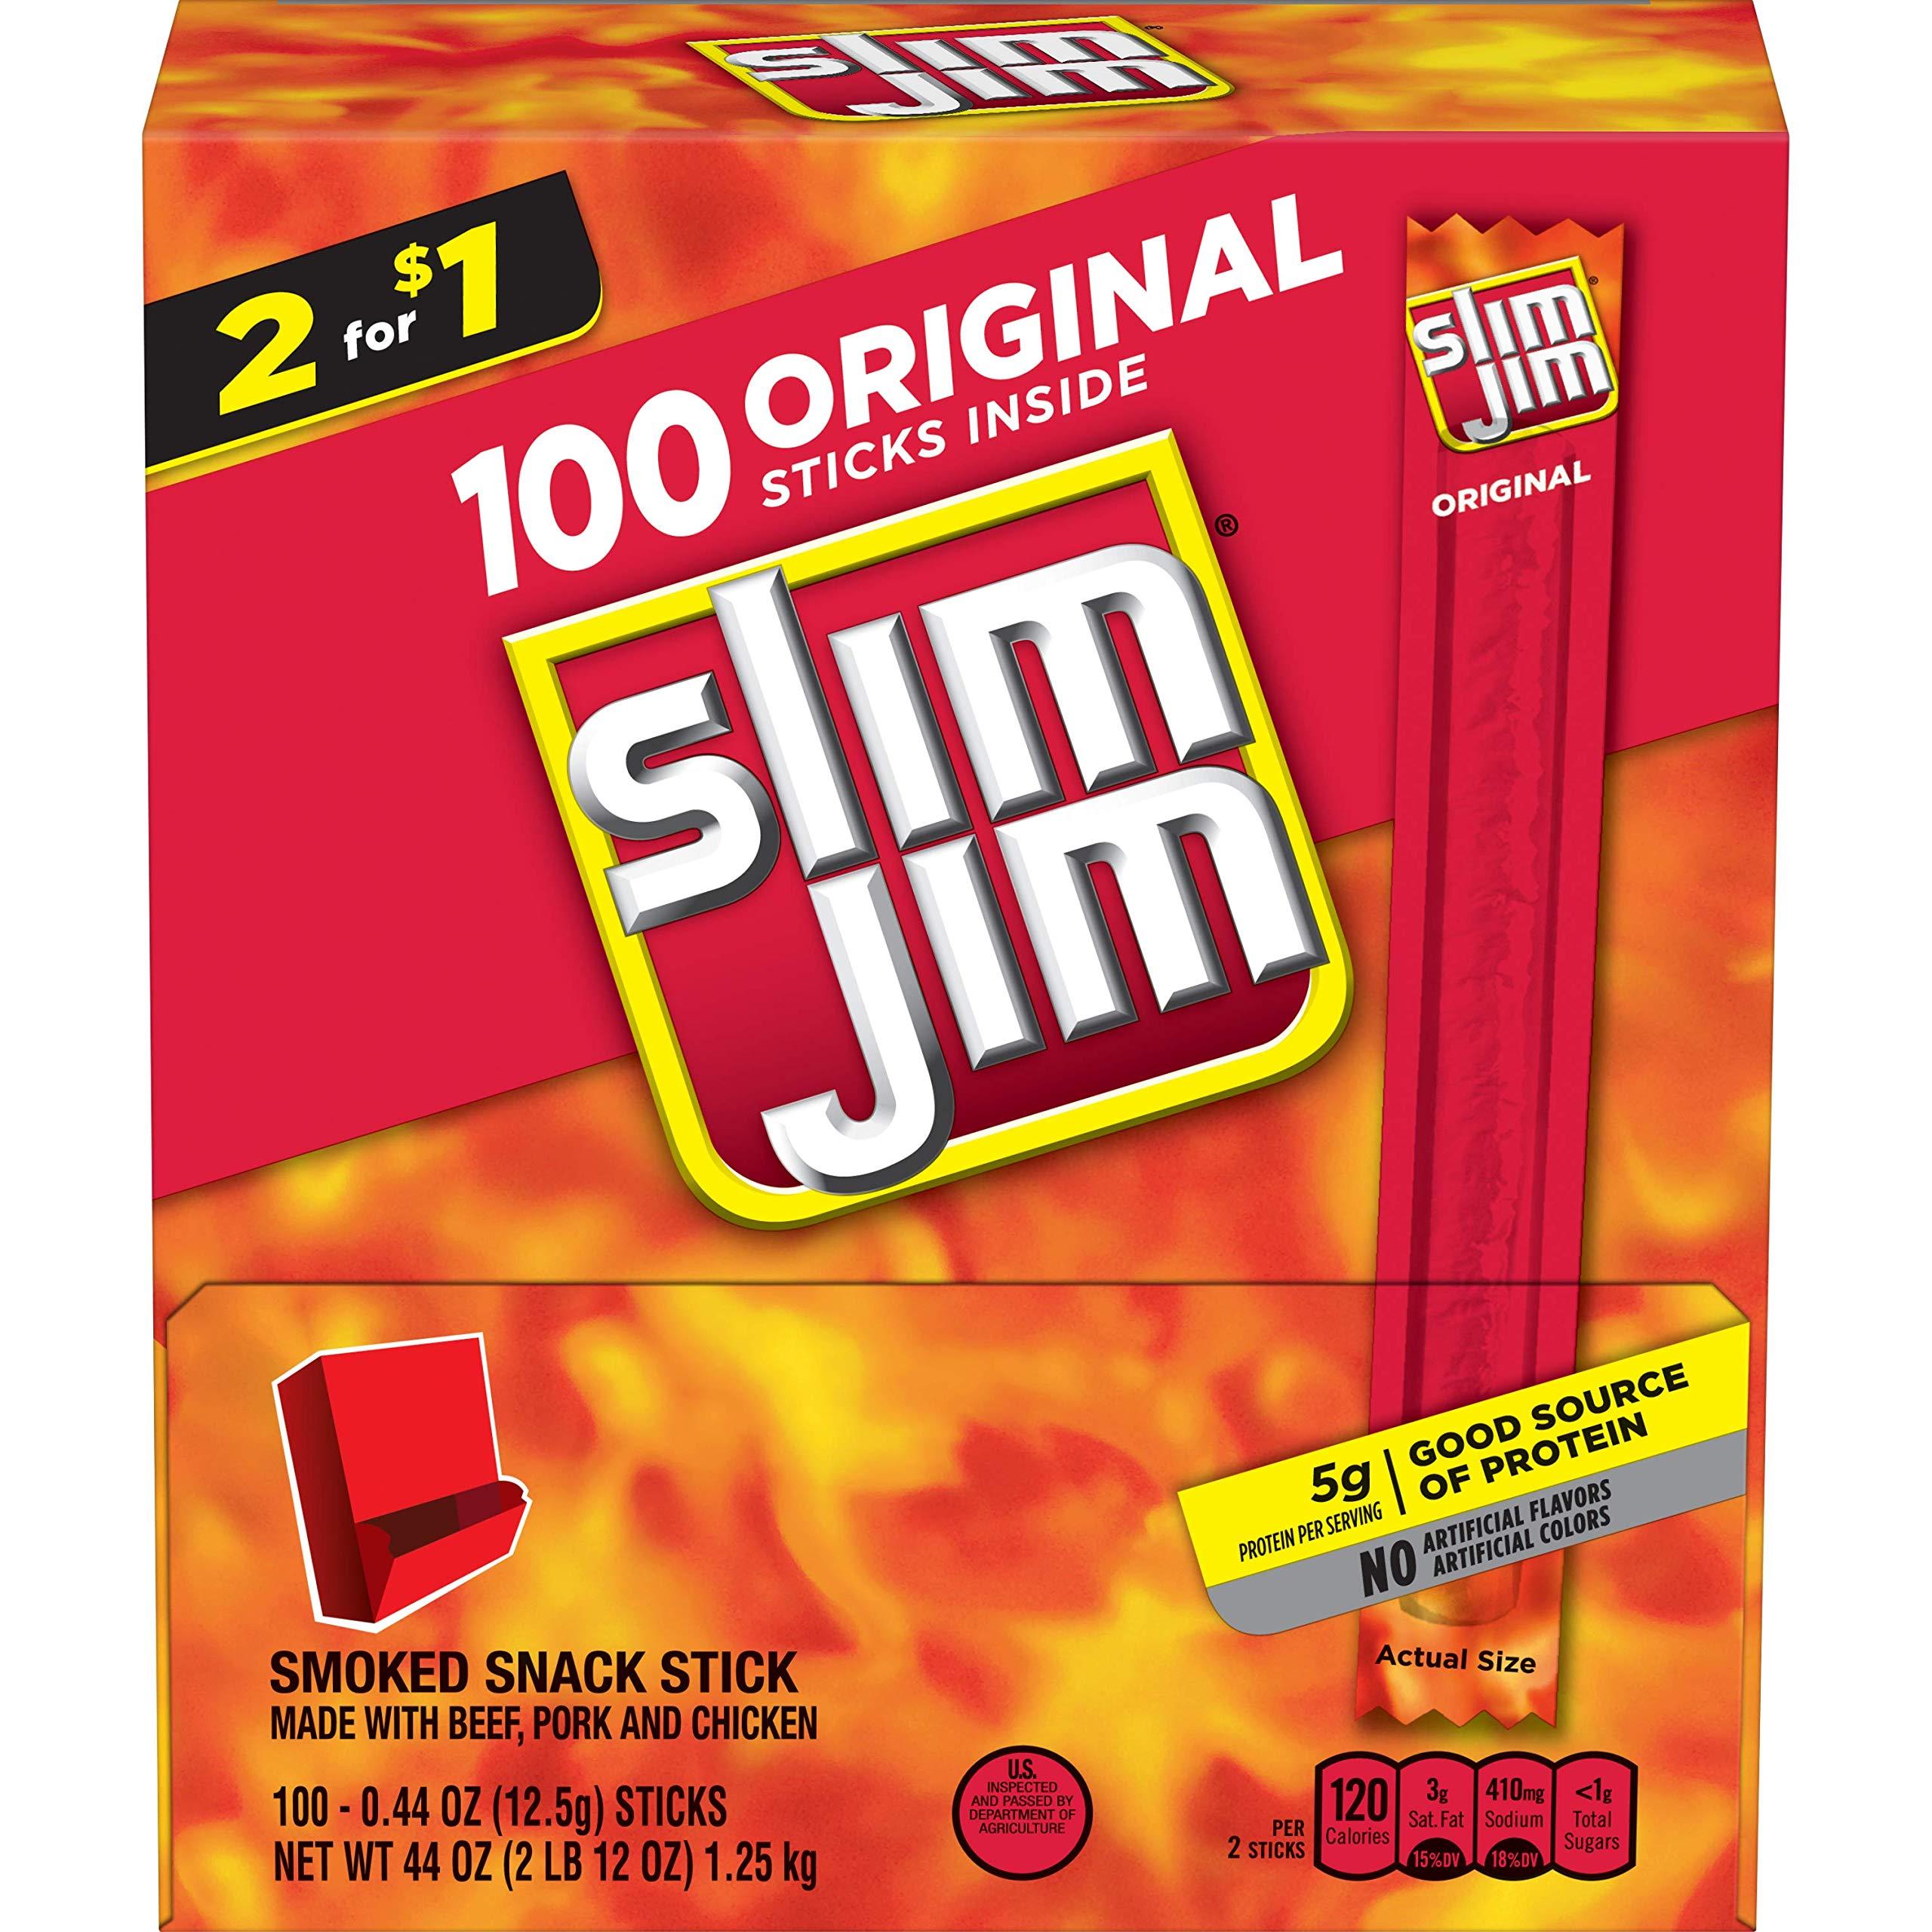 Slim Jim Snack-Sized Smoked Meat Stick, Original Flavor, Keto Friendly, .44 Oz. (Pack of 100) by Slim Jim